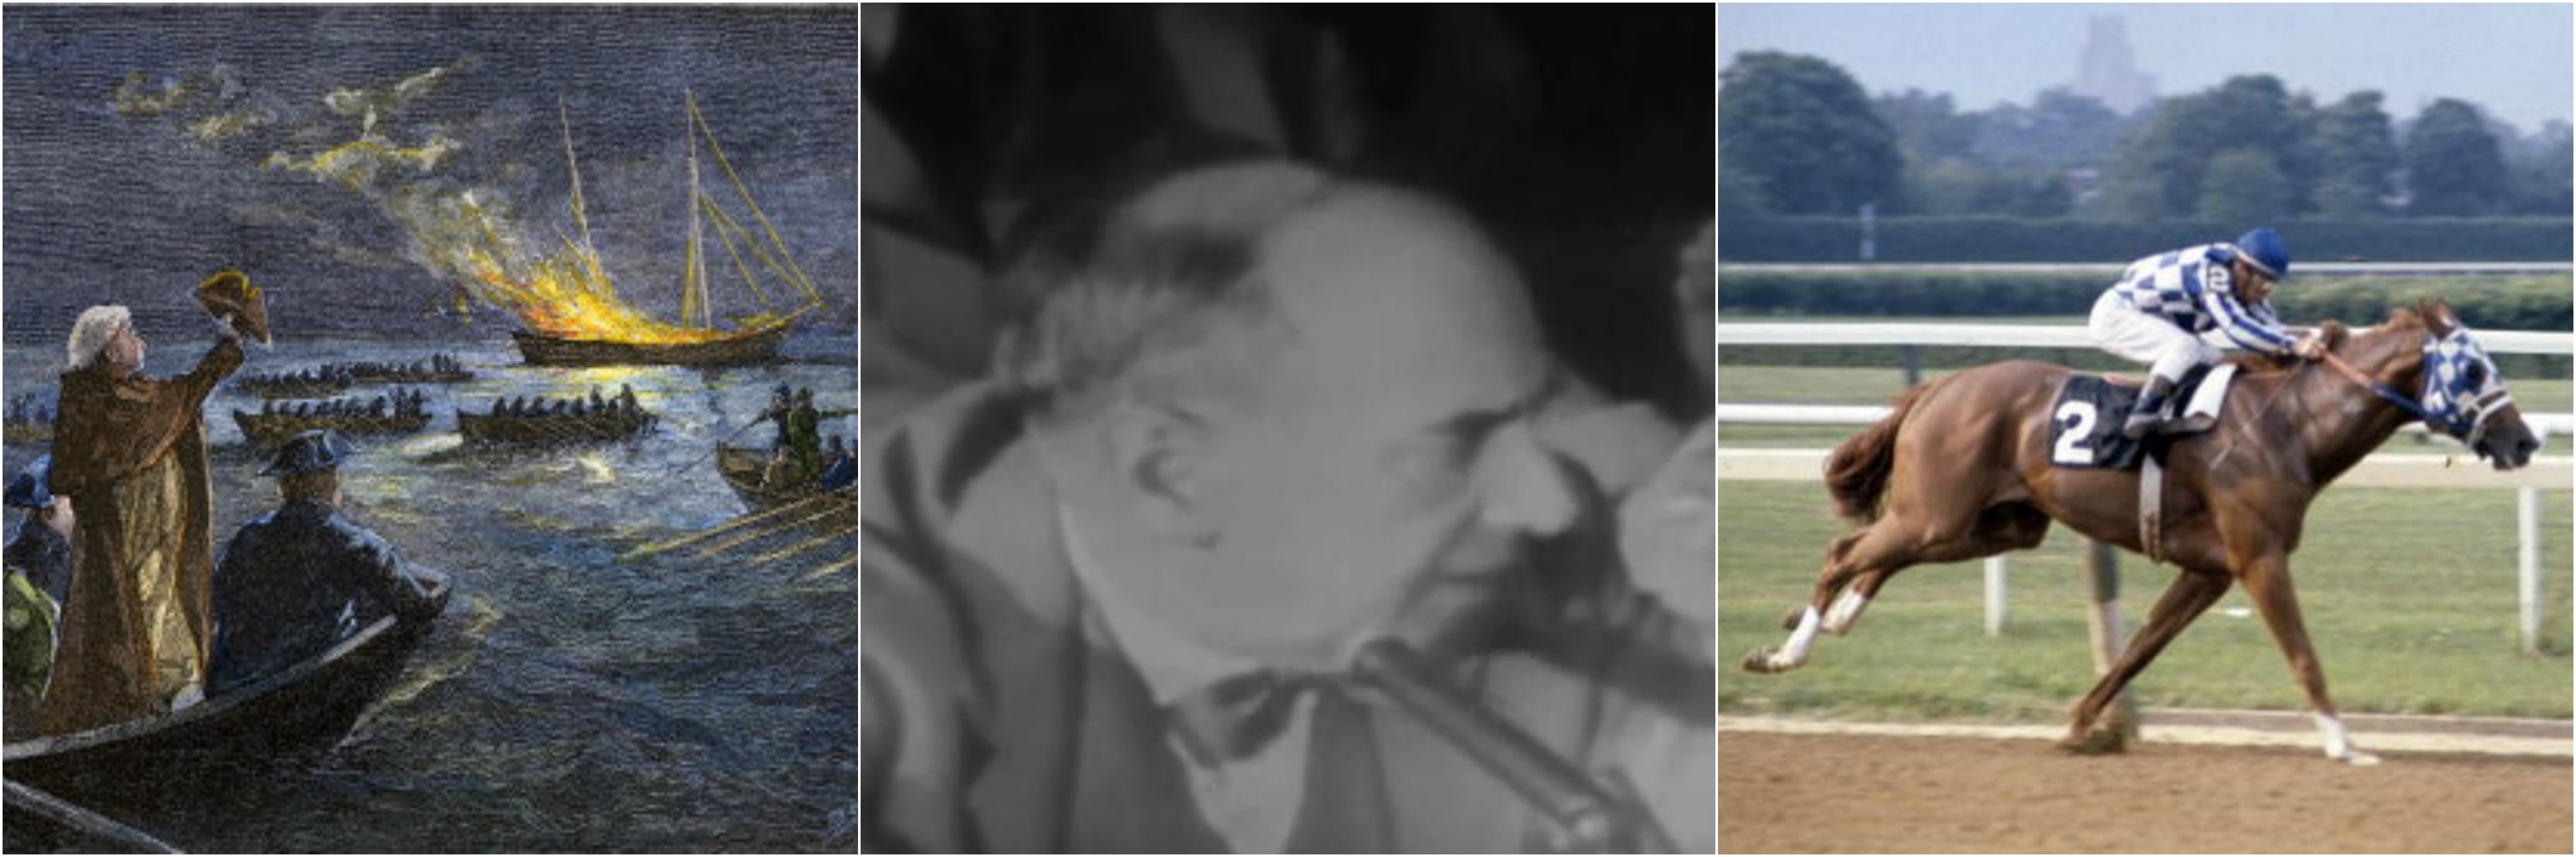 Jun-9: The Spark of Revolution, McCarthy Challenged and Secretariat